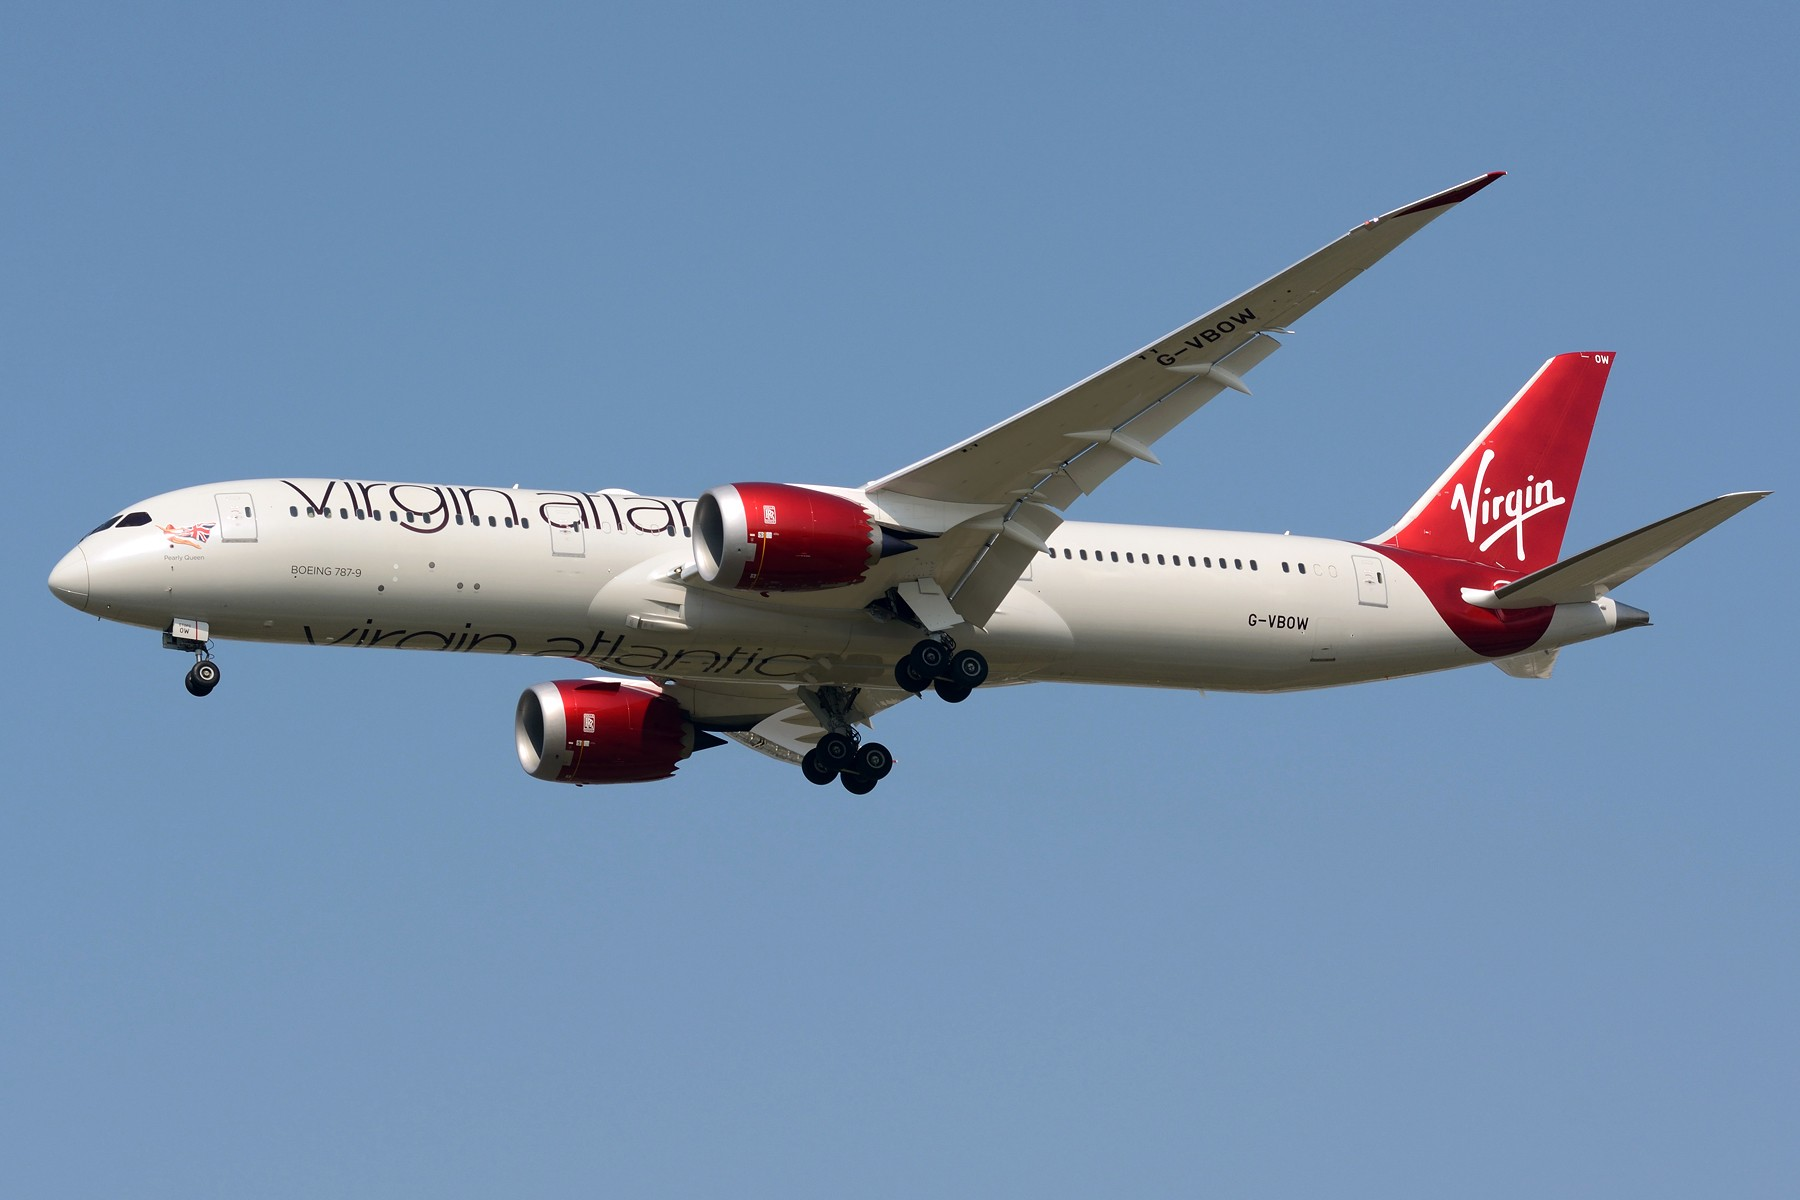 Re:[原创][PVG] 787系列之红白涂装 BOEING 787-9 G-VBOW PVG